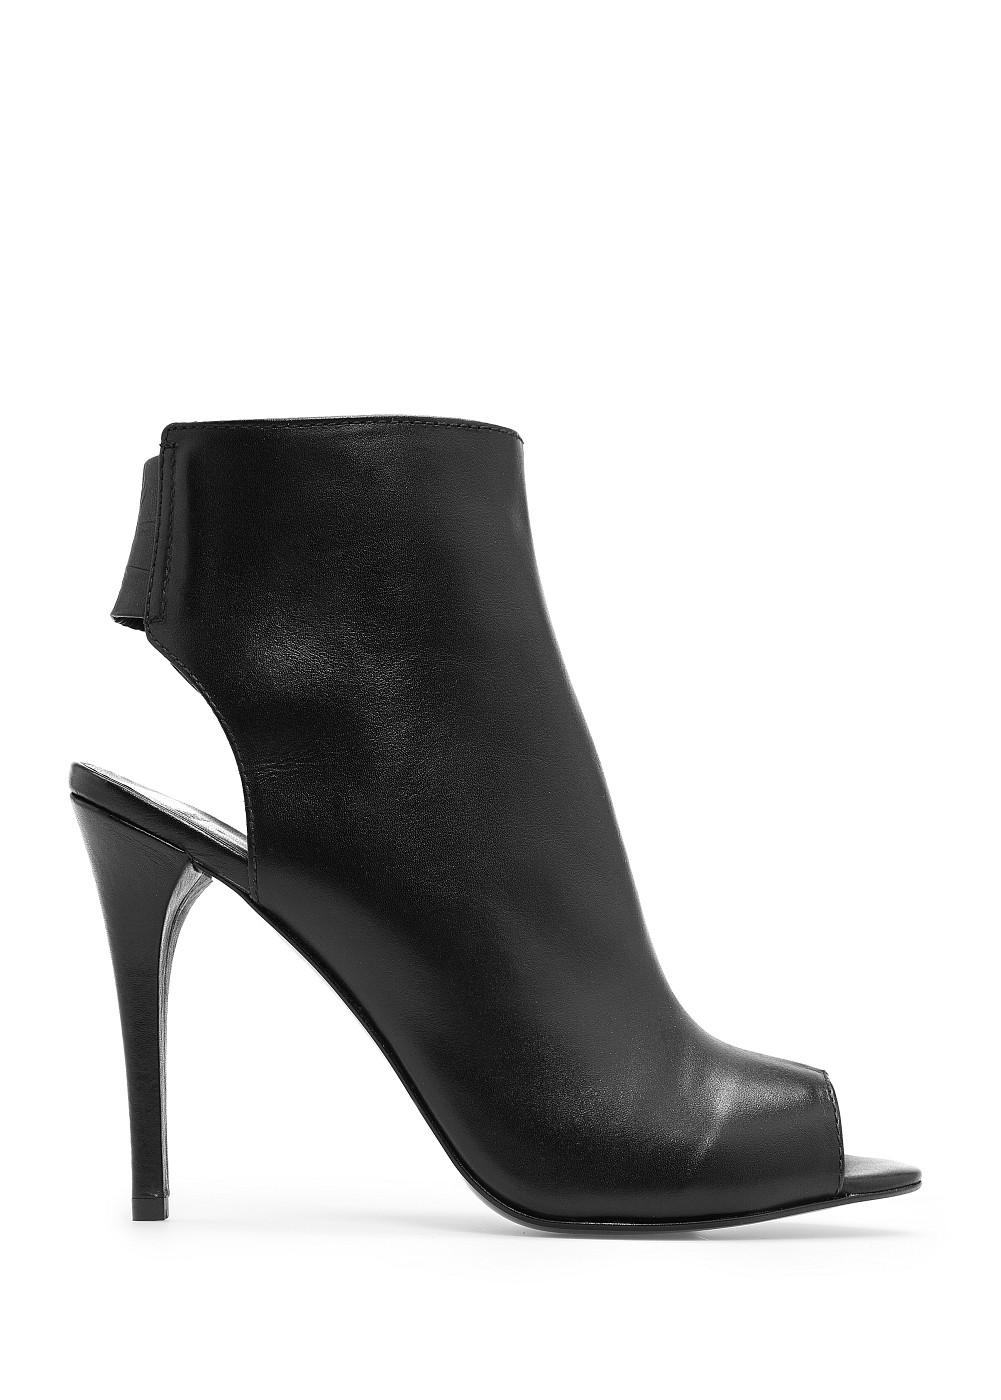 Botines peep-toe piel - Calzado - Mujer - OUTLET